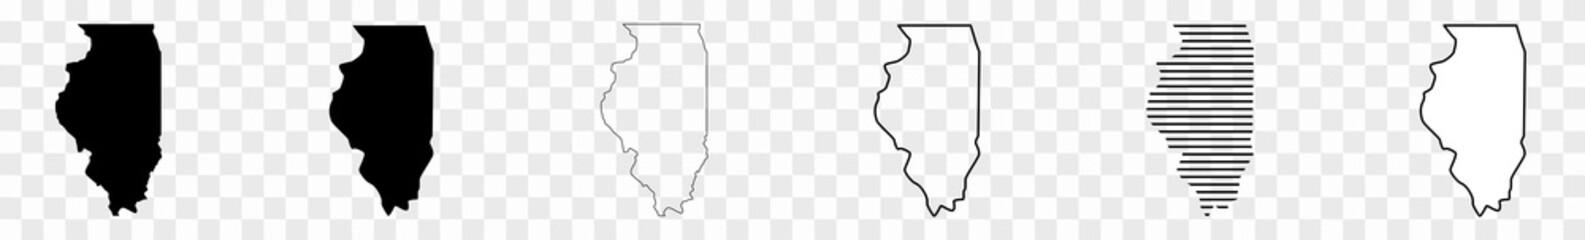 Illinois Map Black | State Border | United States | US America | Transparent Isolated | Variations